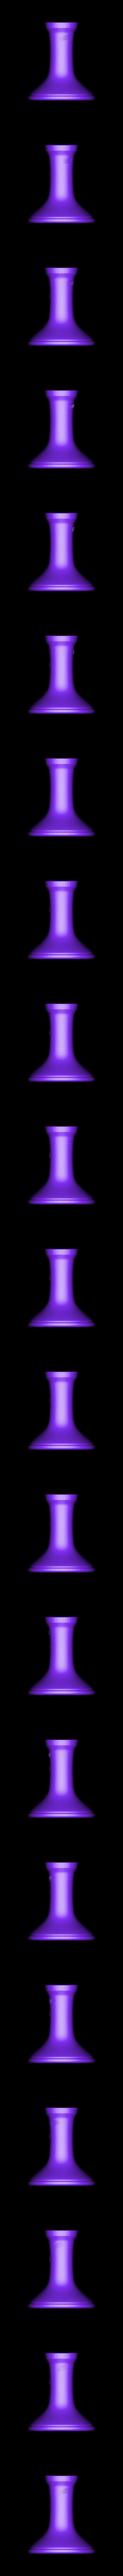 darbuka.stl Download free STL file BUKA DRUM A • 3D printing template, 3DShook